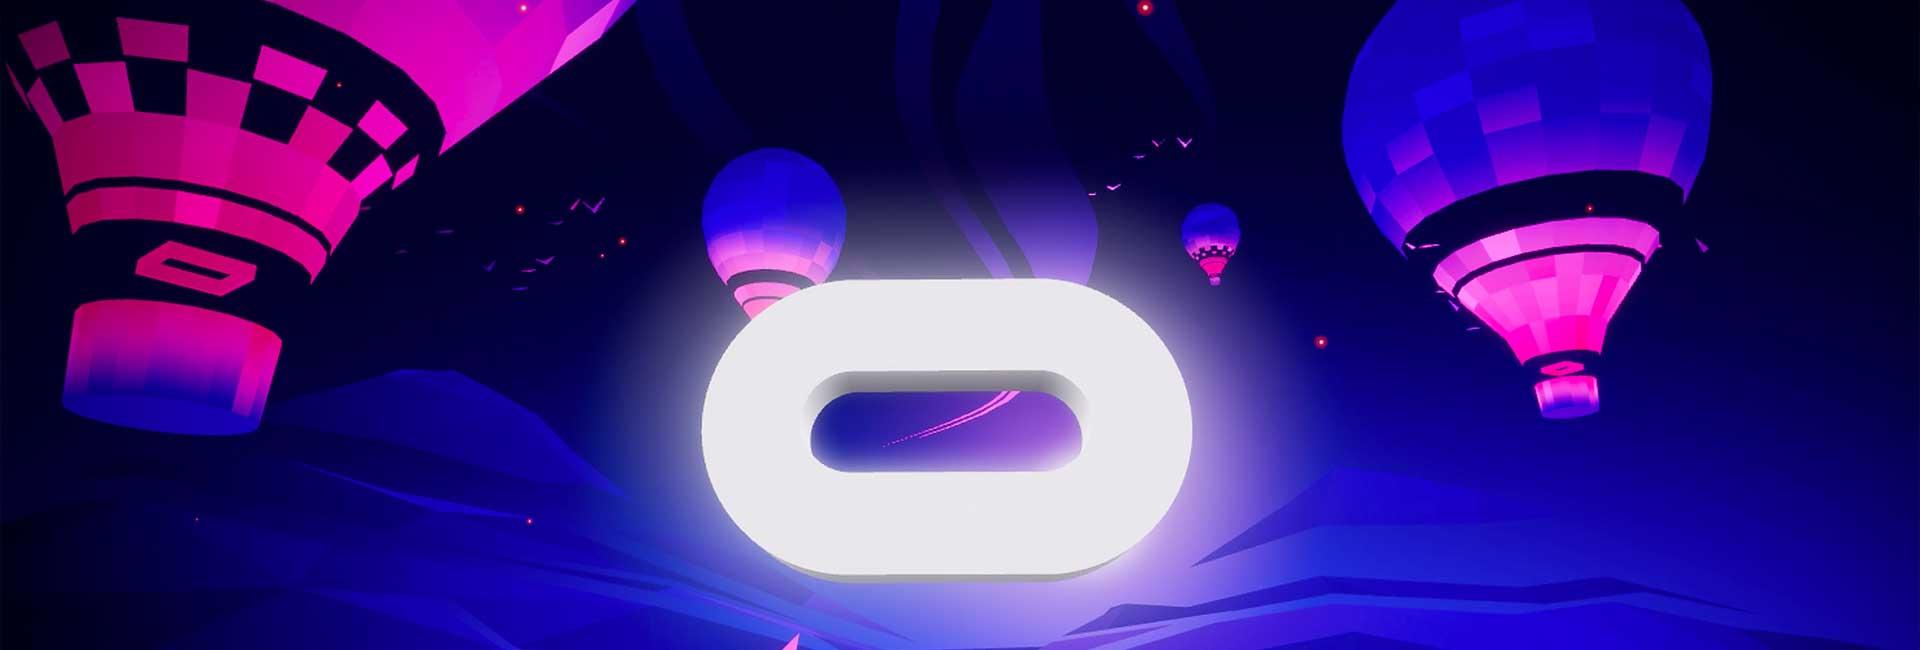 unity-oculus-vr